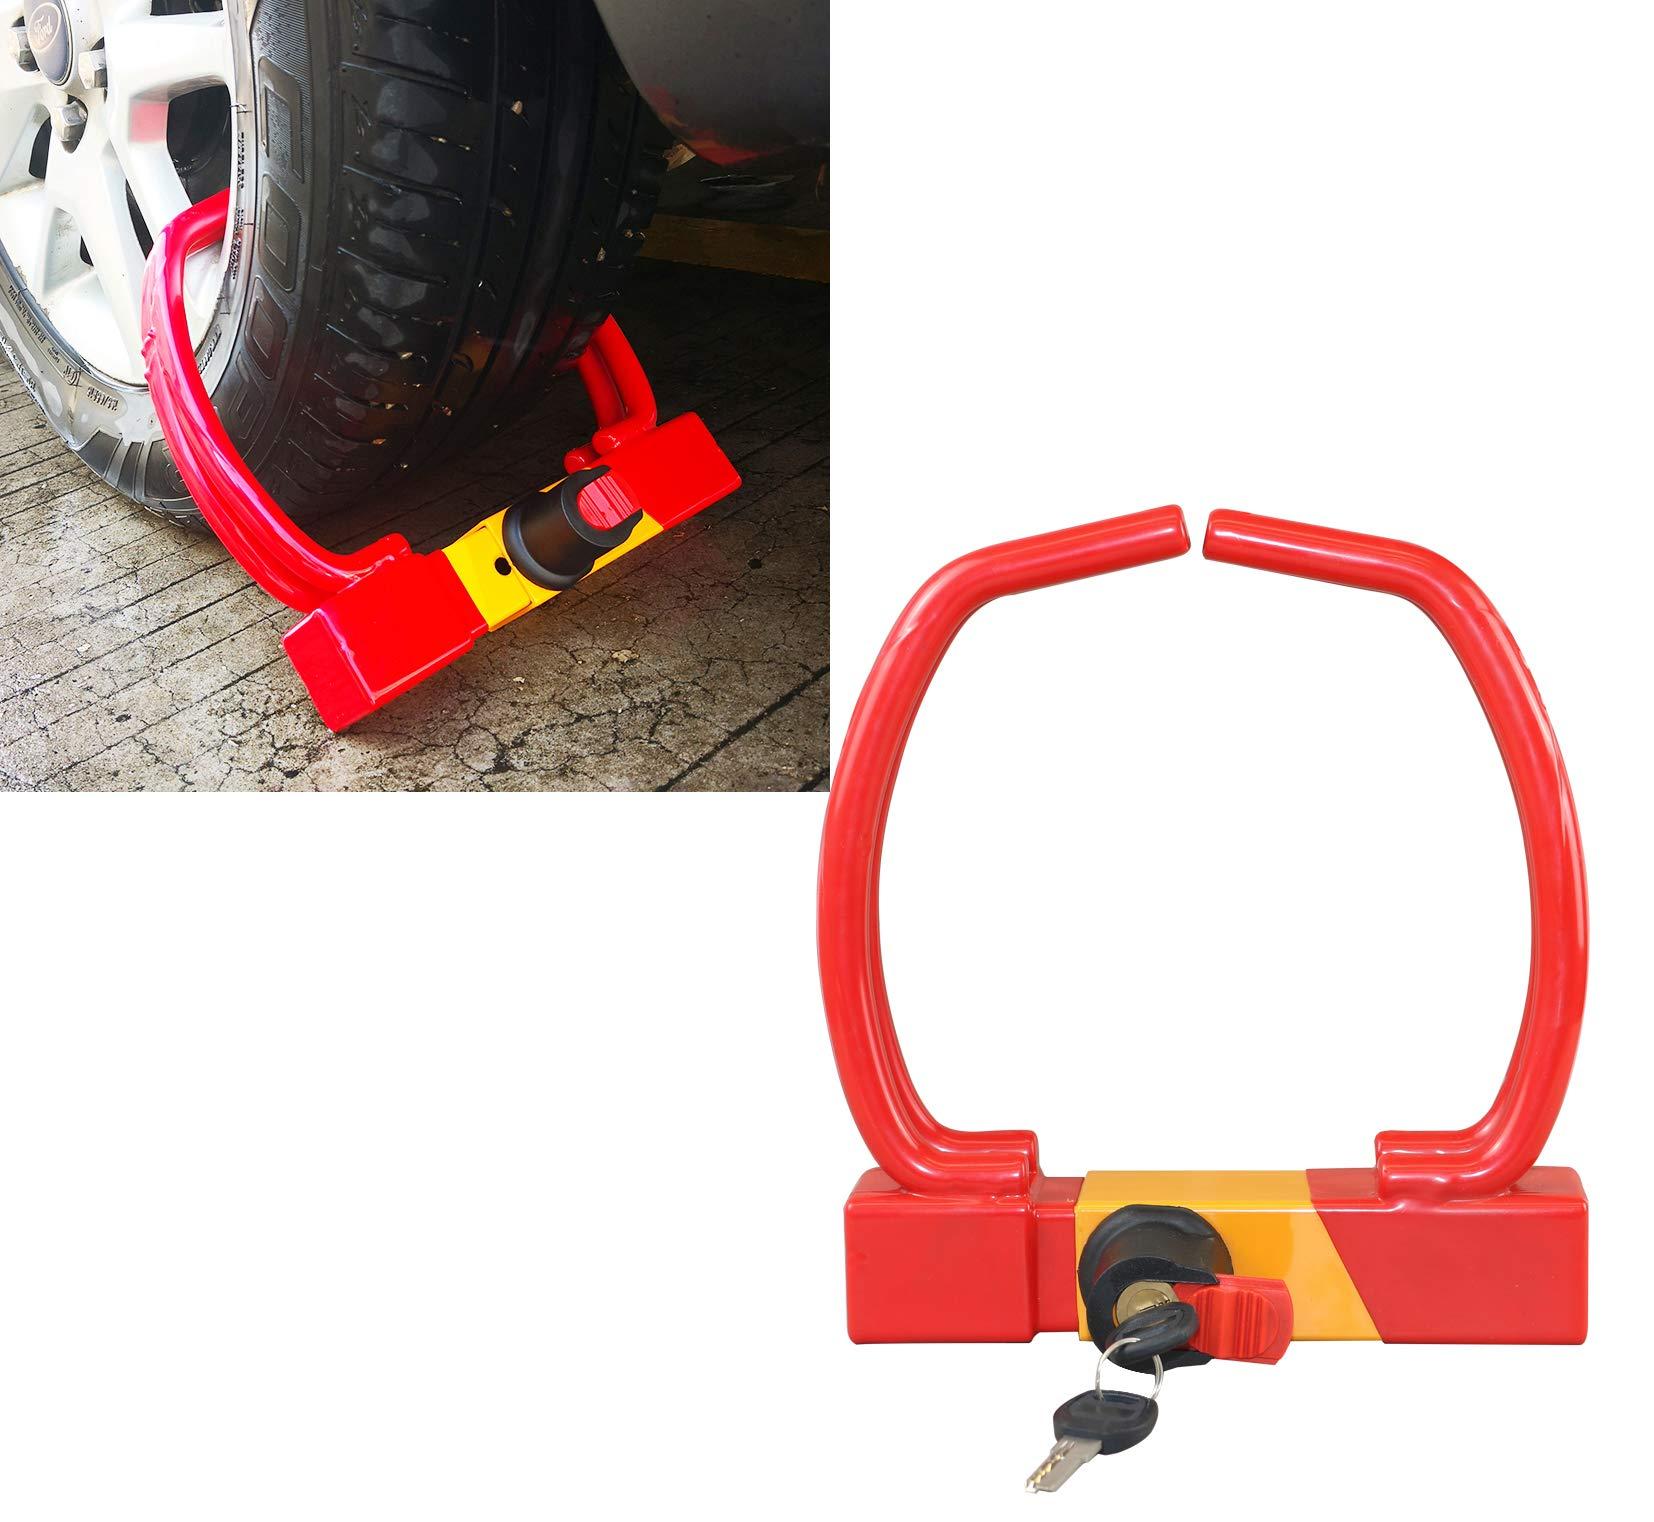 Red Universal Heavy Duty Security Anti-Theft Wheel Clamp Max 12'' Lock w/2 Keys